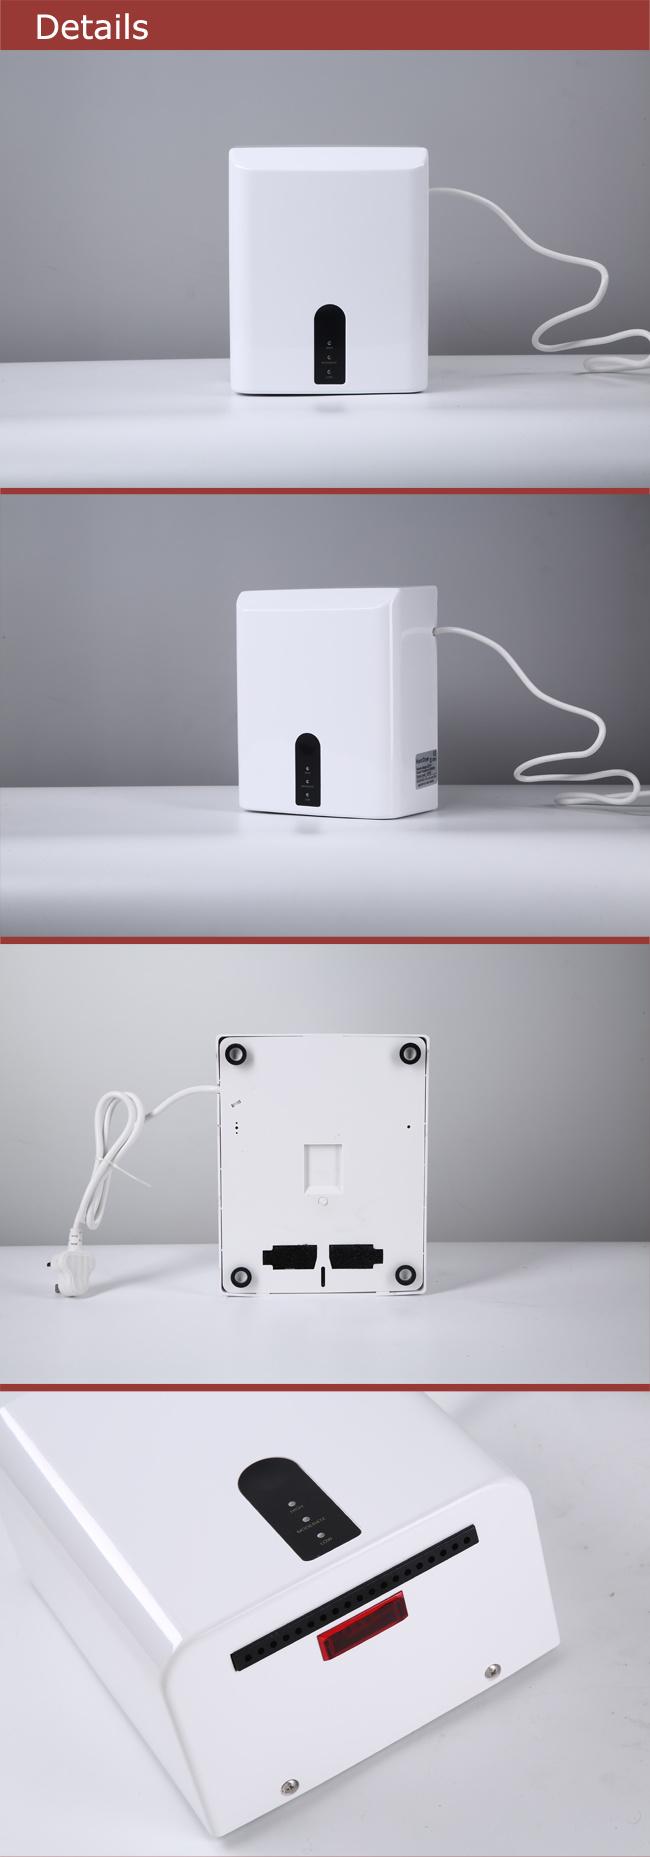 Automatic Hand Dryer FL-2006